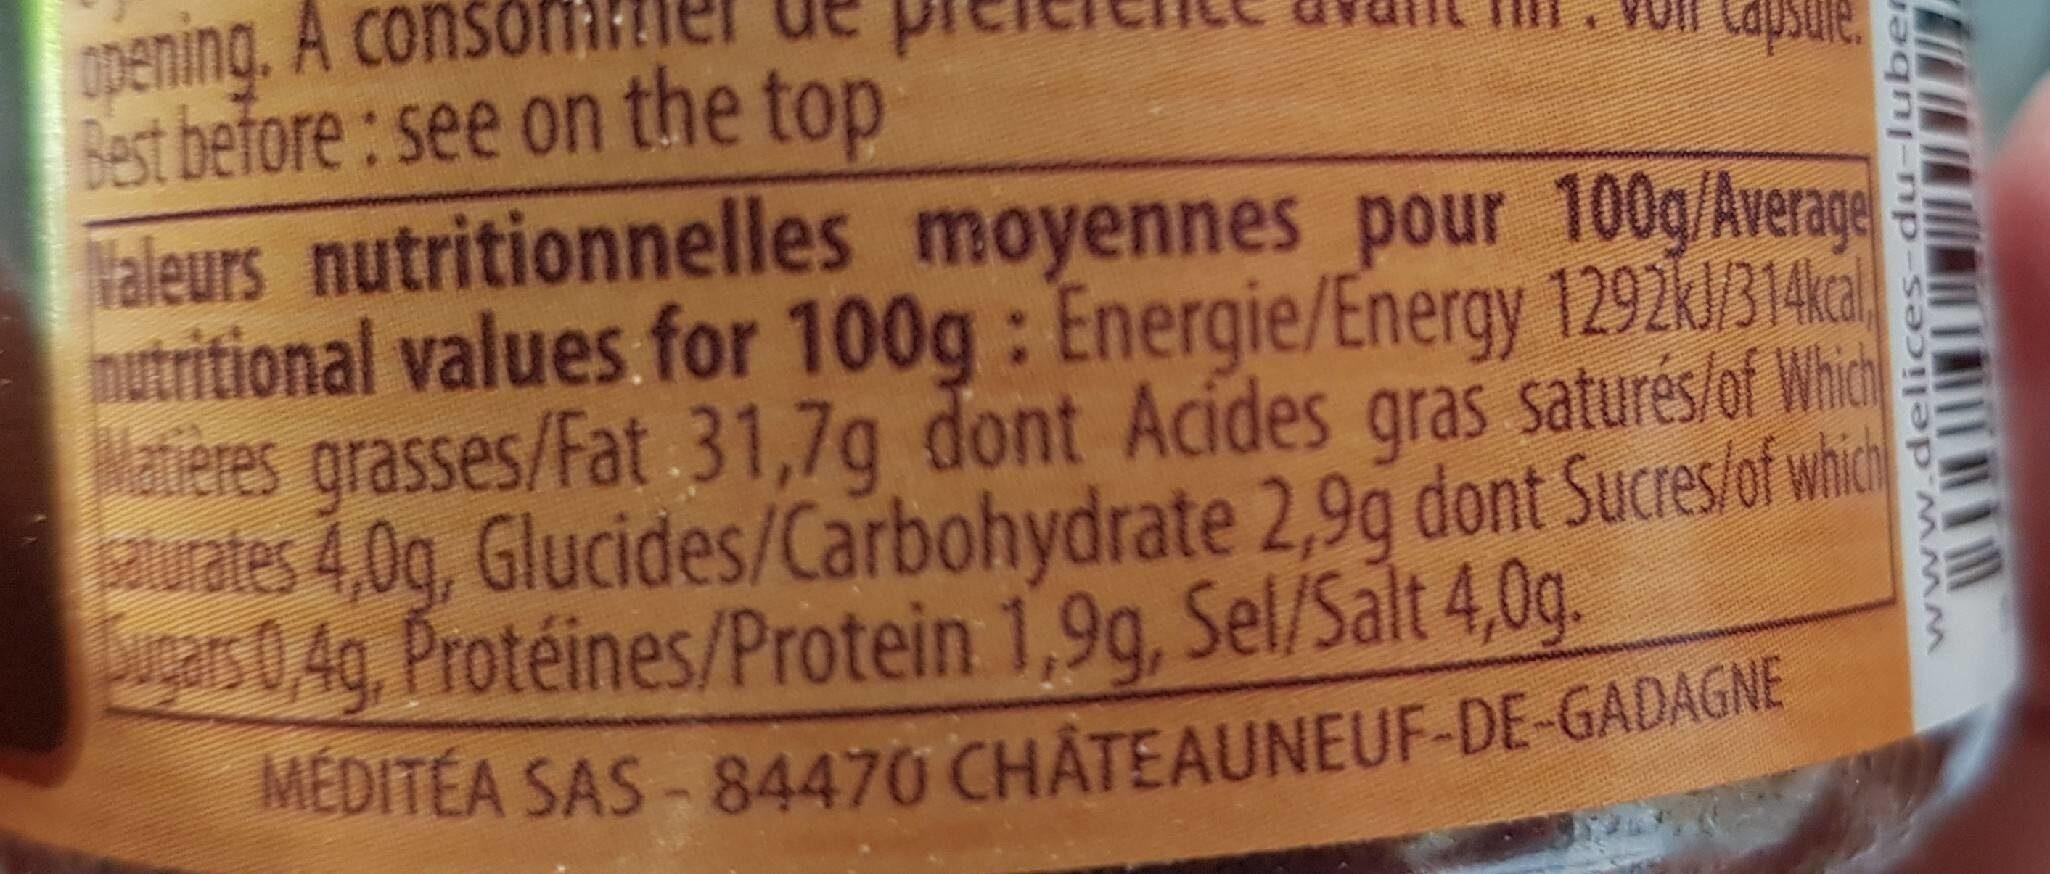 Tapenade noir - Informations nutritionnelles - fr